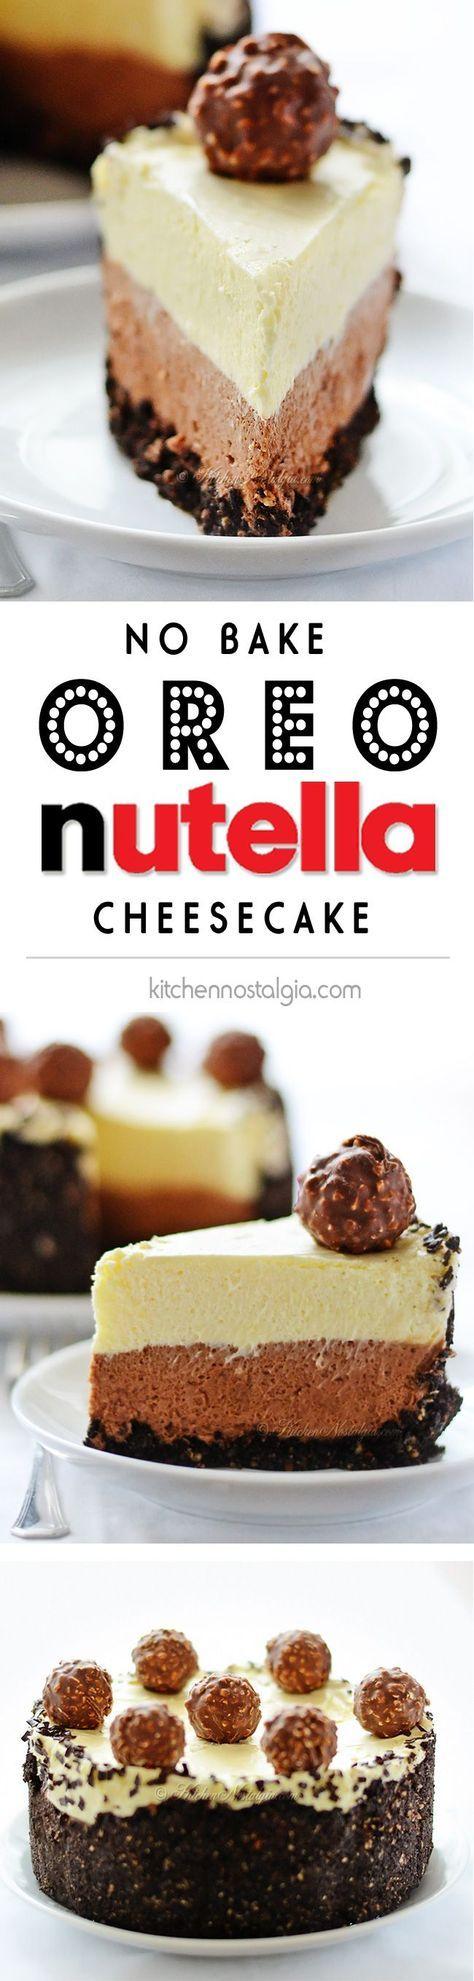 Nutella Oreo Cheesecake - divine no bake dessert with Oreo cookie crust, Nutella cheesecake layers and decorated with Ferrero Rocher chocolate candies - kitchennostalgia.com